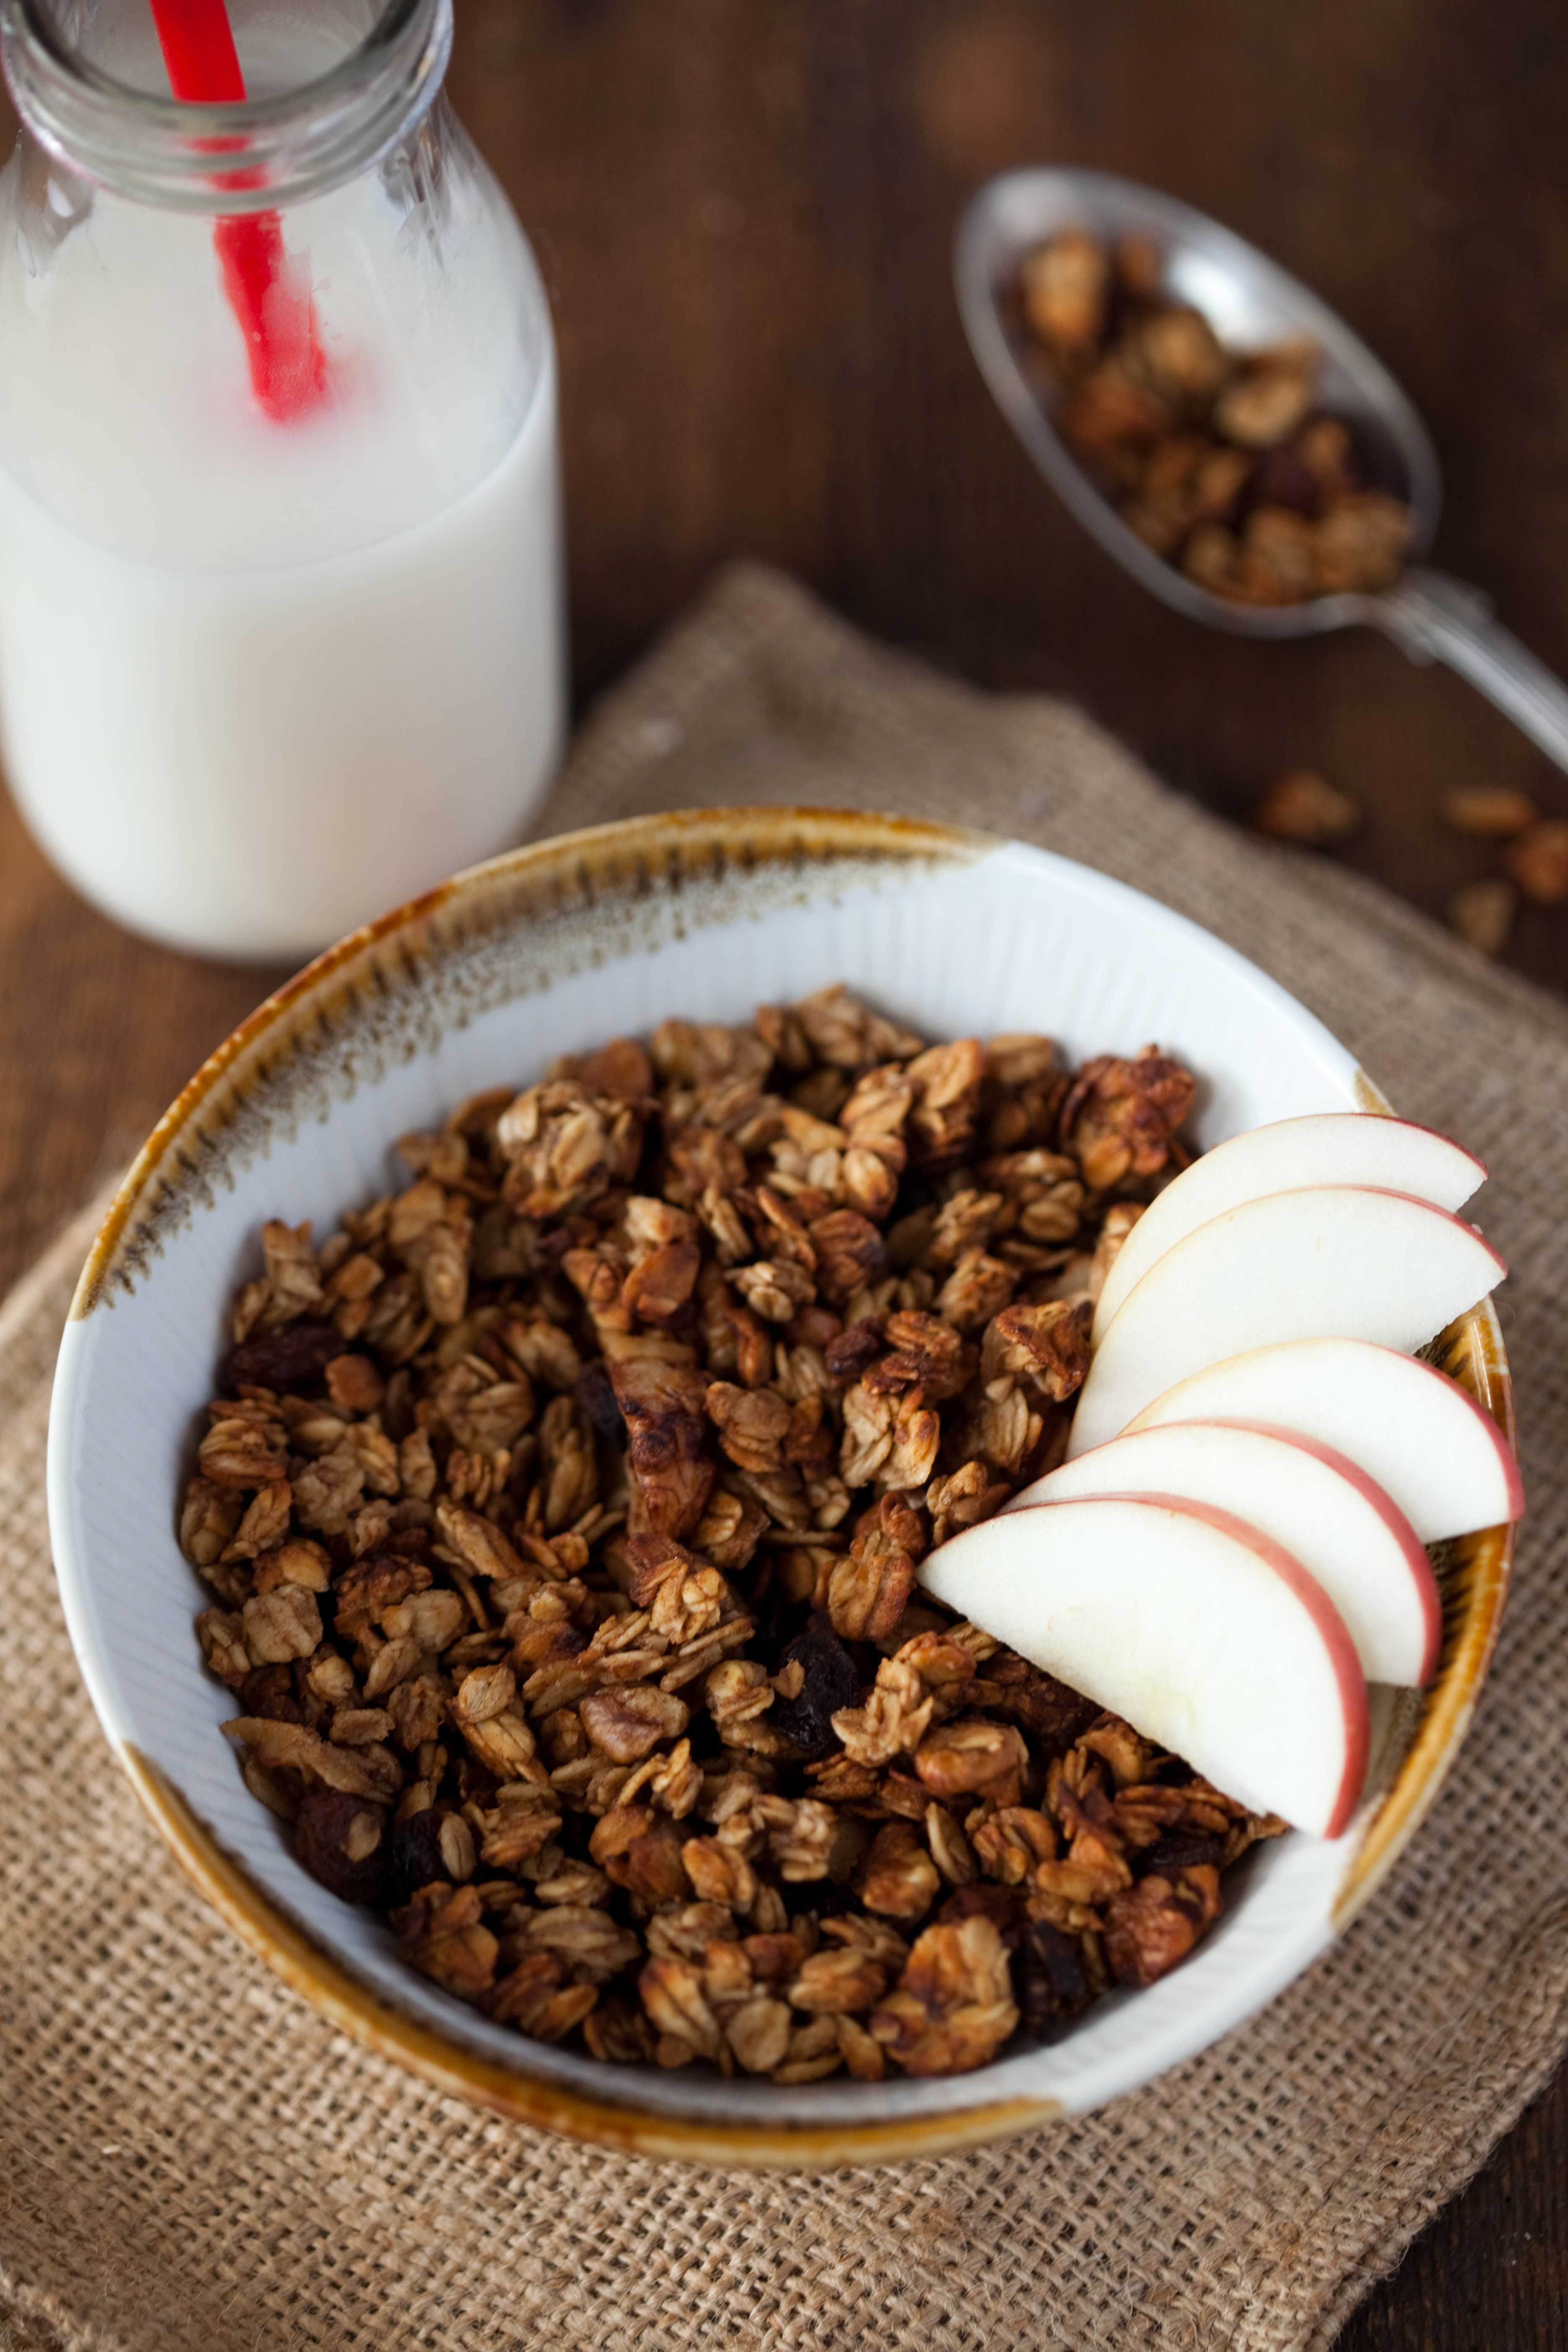 szarlotkowa-granola-z-jablkami-orzechami